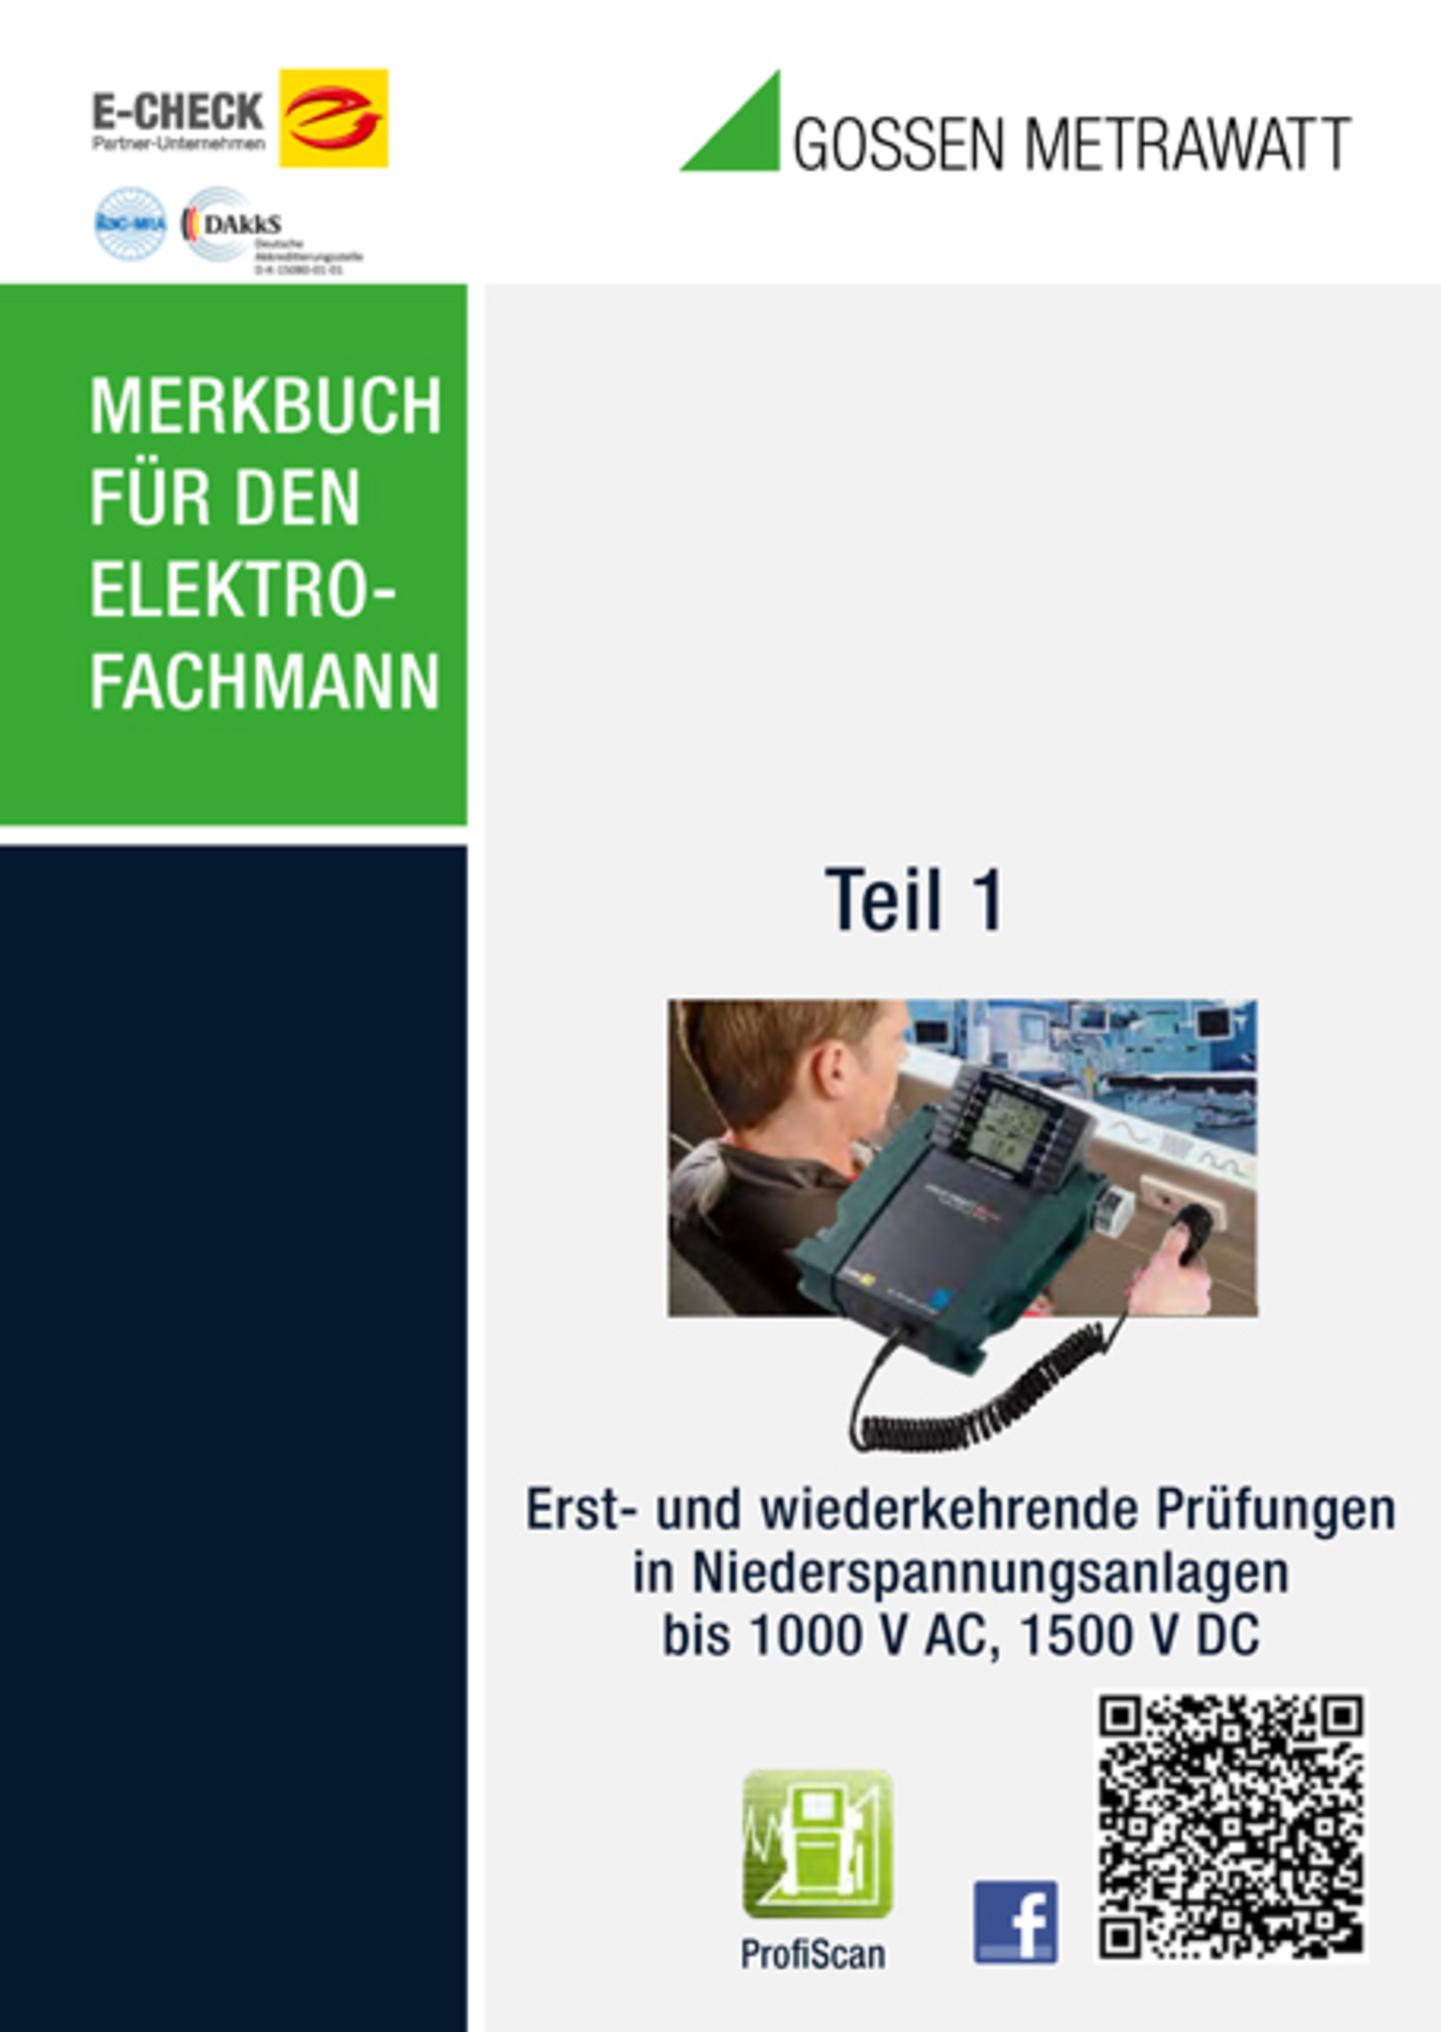 bs-gossen-metrawatt-katalog_07